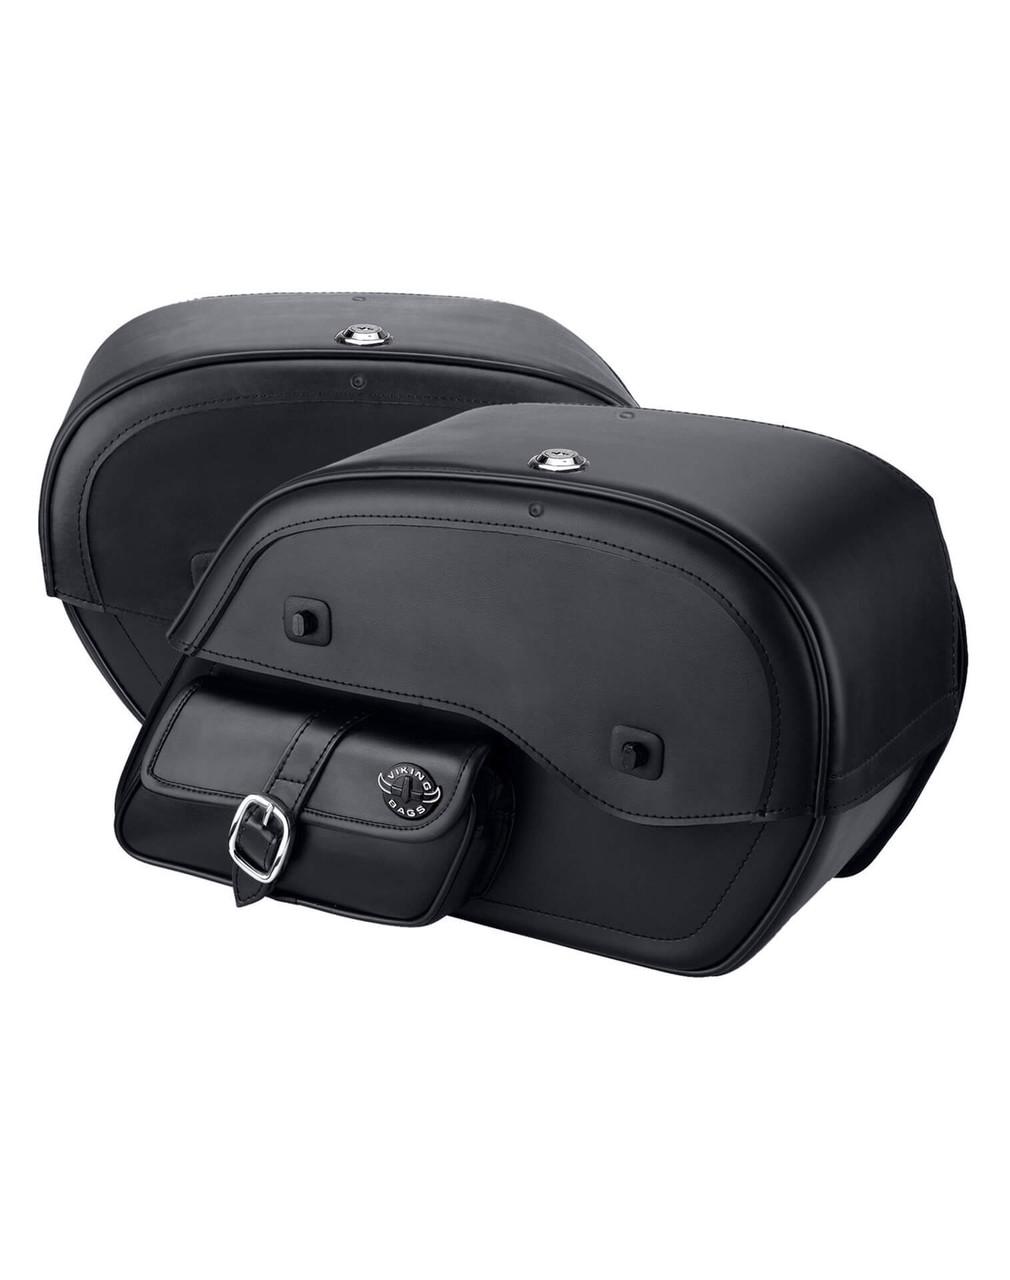 Honda Magna 750 Charger Side Pocket With Shock Cutout Motorcycle Saddlebags both bags view